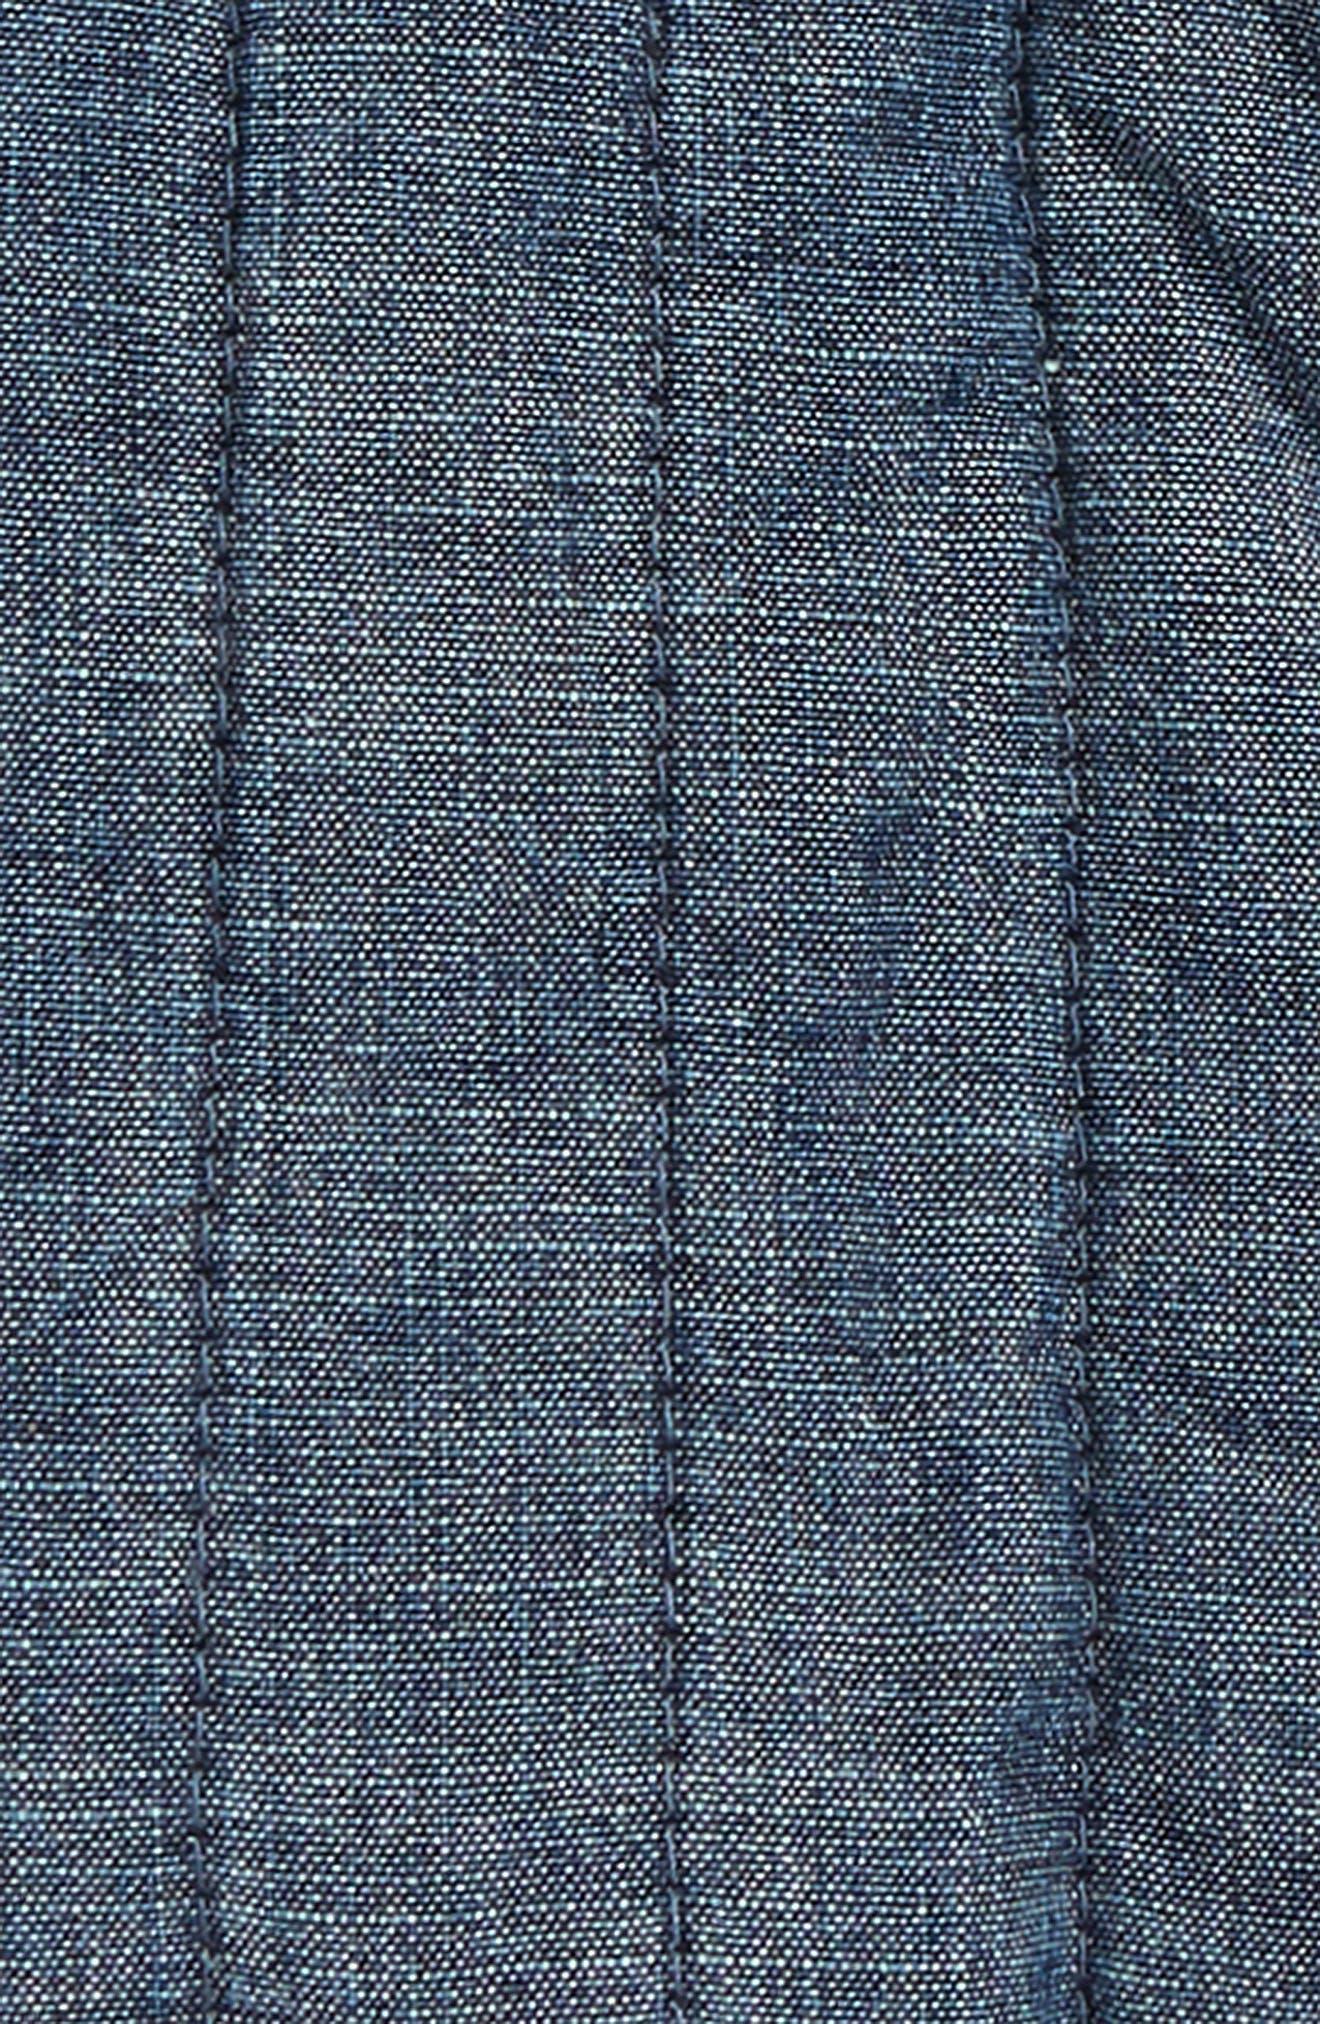 Citizen Chambray Vest,                             Alternate thumbnail 2, color,                             Blue Chambray